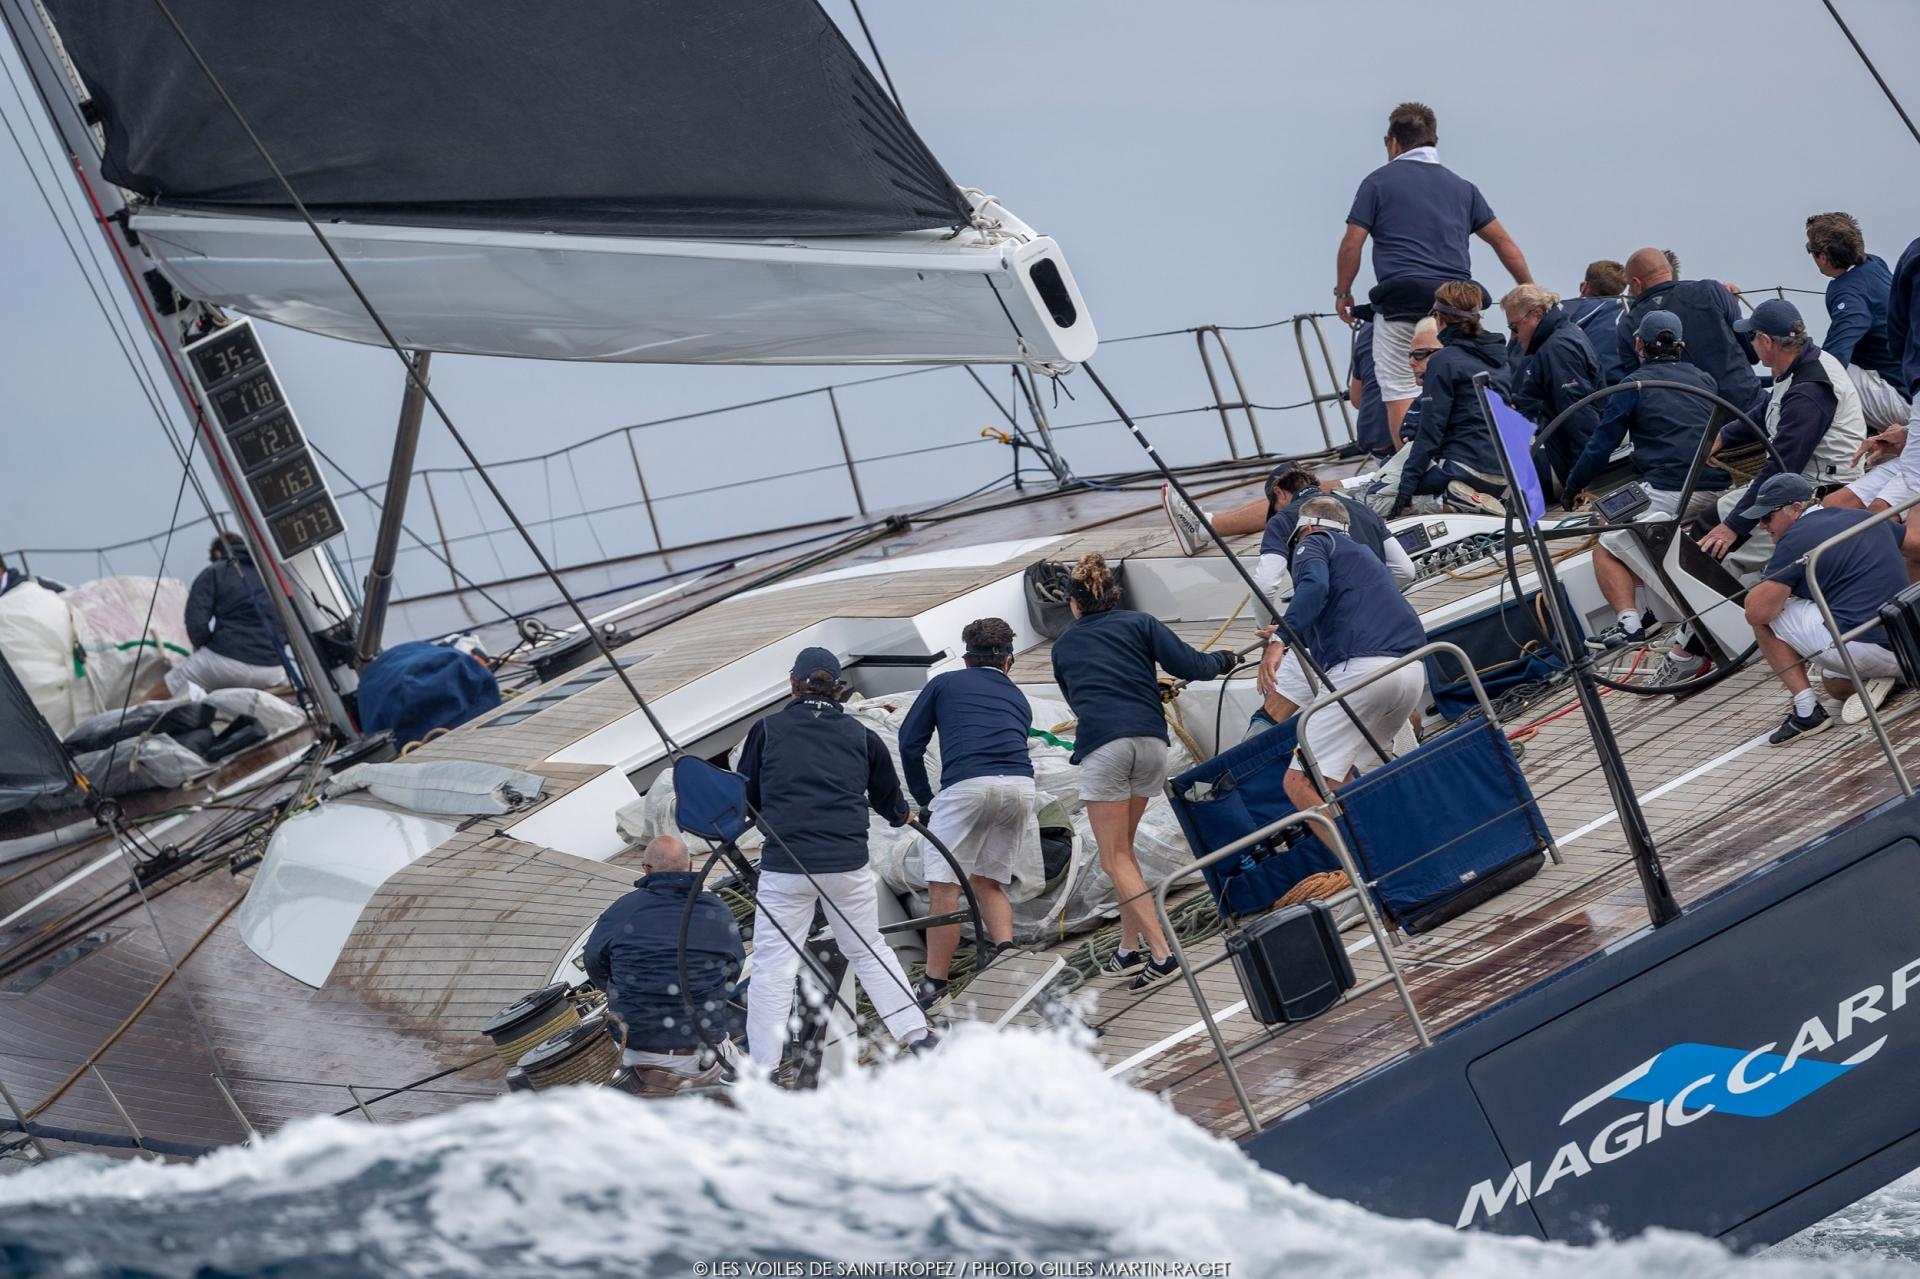 Congratulations to Magic Carpet 3 on victory at Les Voiles de Saint-Tropez - NEWS - Yacht Club Costa Smeralda